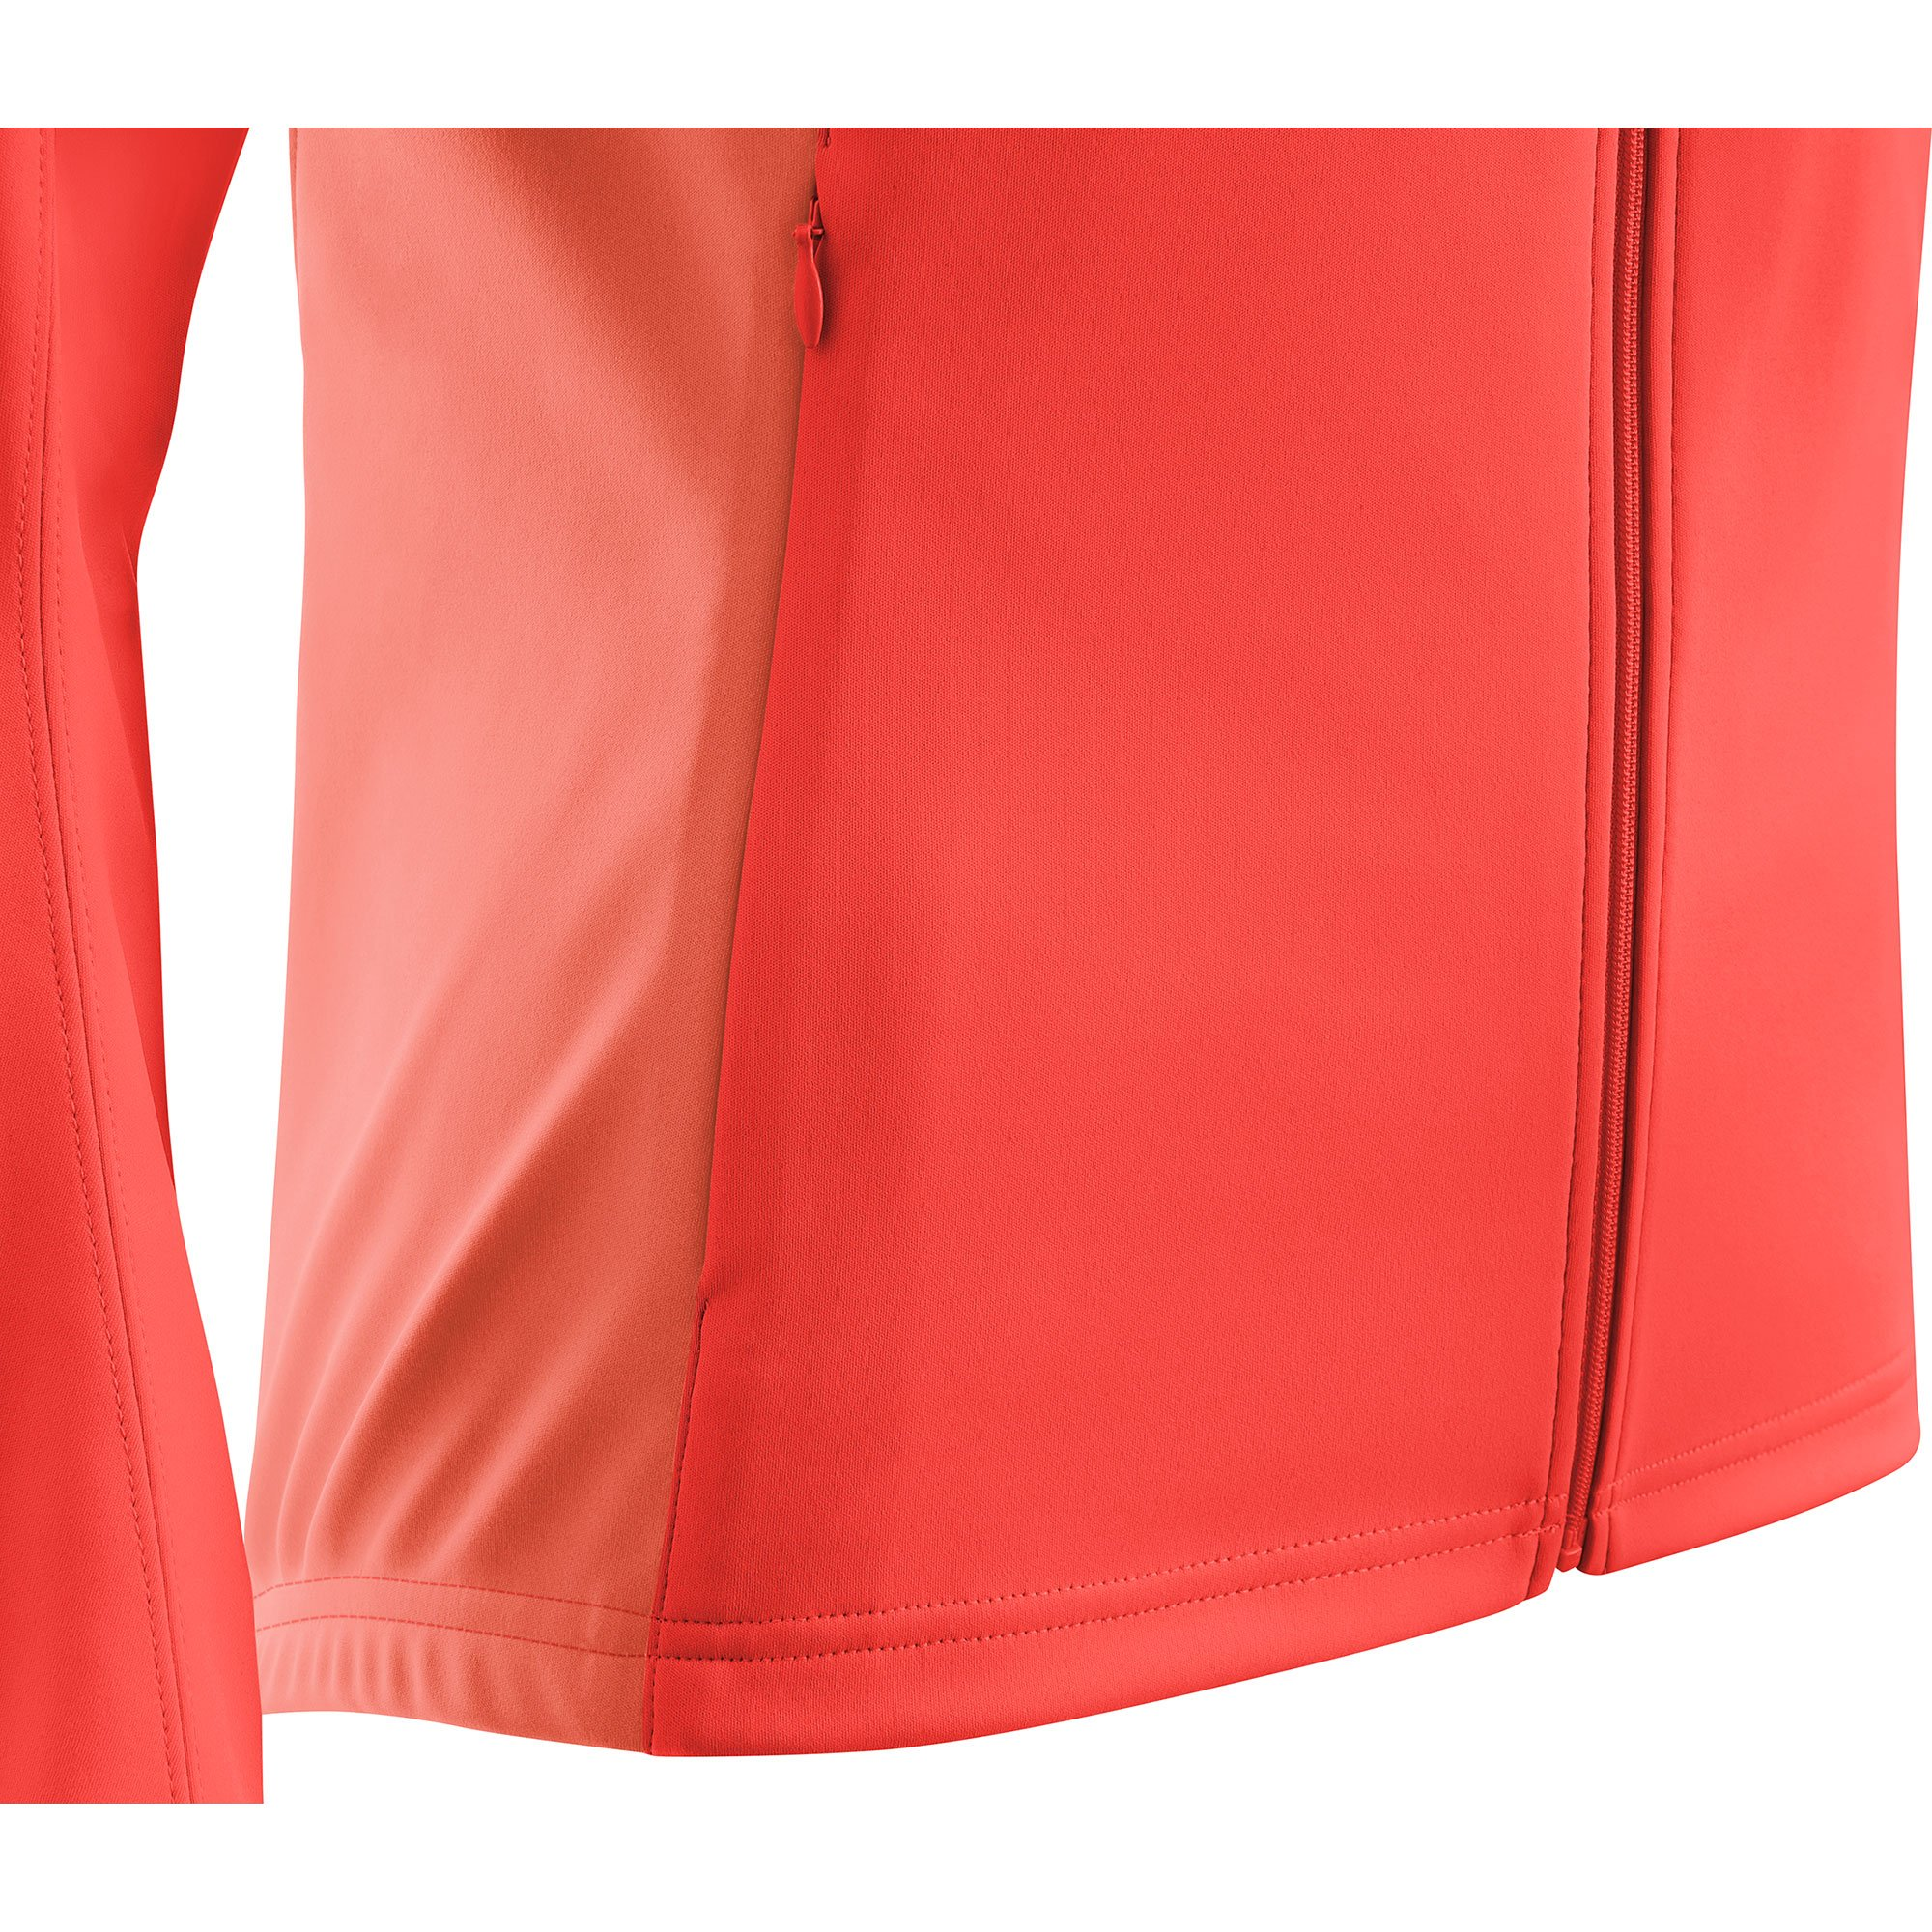 GORE Wear Women's Windproof Cycling Jacket, Removable Sleeves, GORE Wear C3 Women's GORE Wear WINDSTOPPER Phantom Zip-Off Jacket, Size: M, Color: Lumi Orange/Coral Glow, 100191 by GORE WEAR (Image #7)